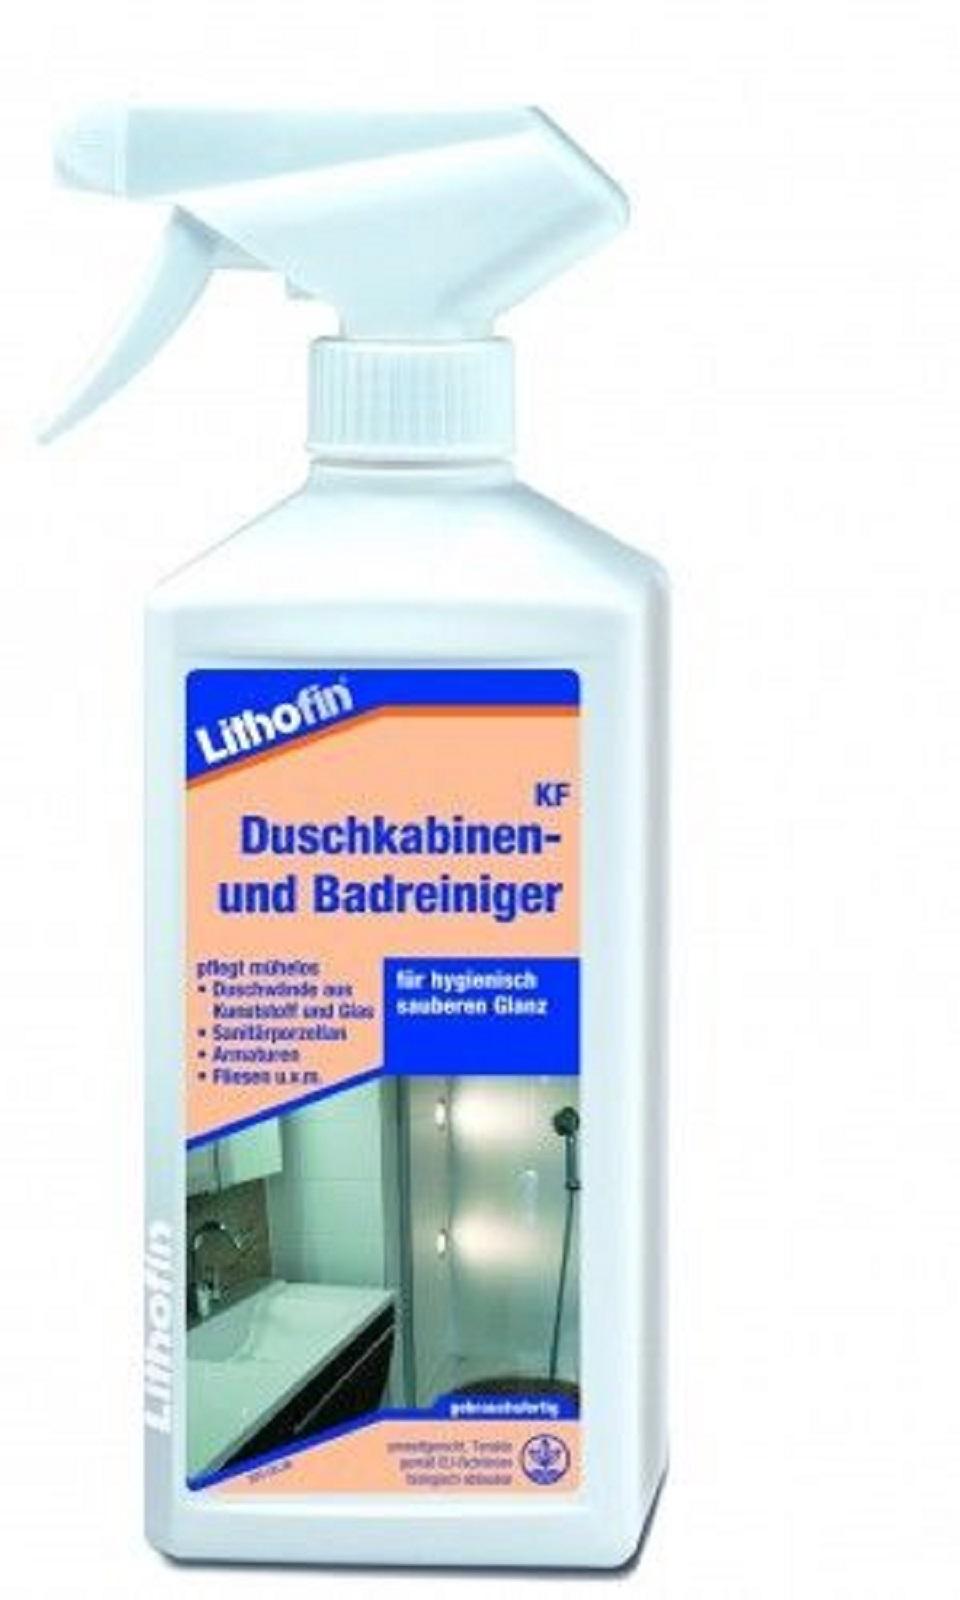 Lithofin KF Duschkabinenreiniger 500 ml